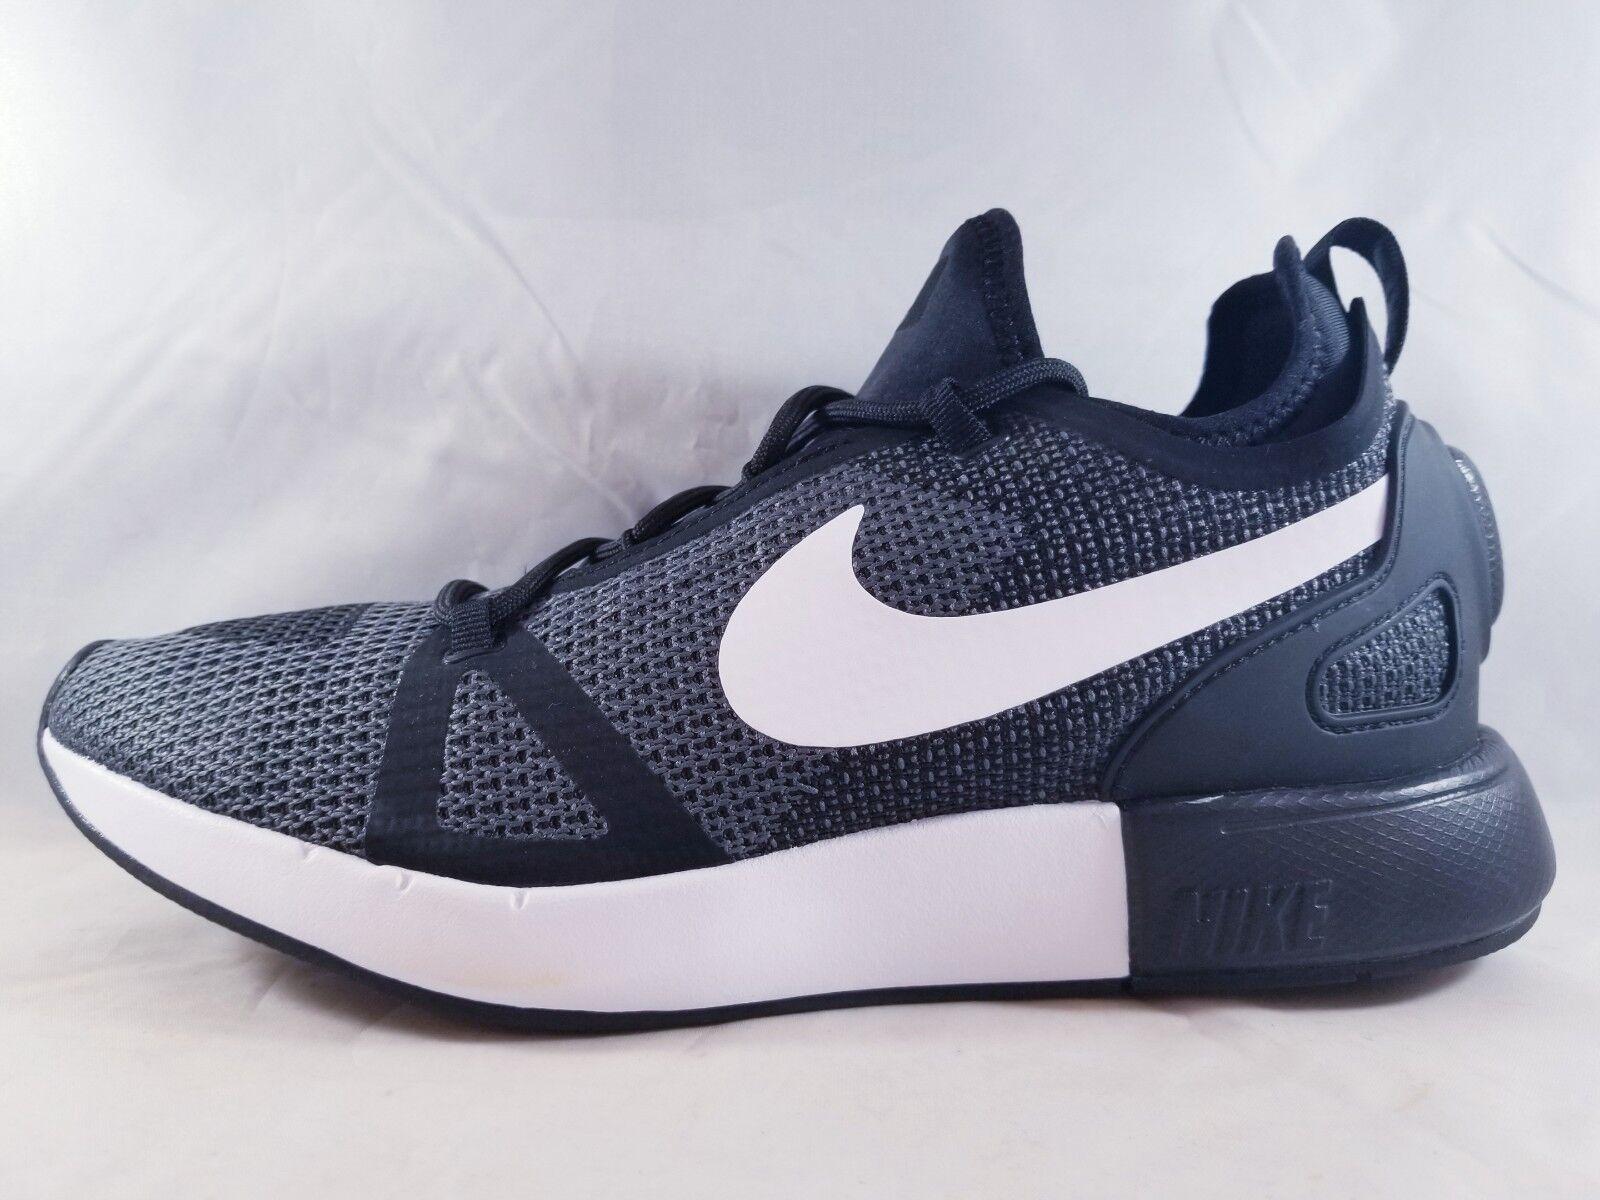 Nike dual - racer männer laufschuh 918228 010 größe.